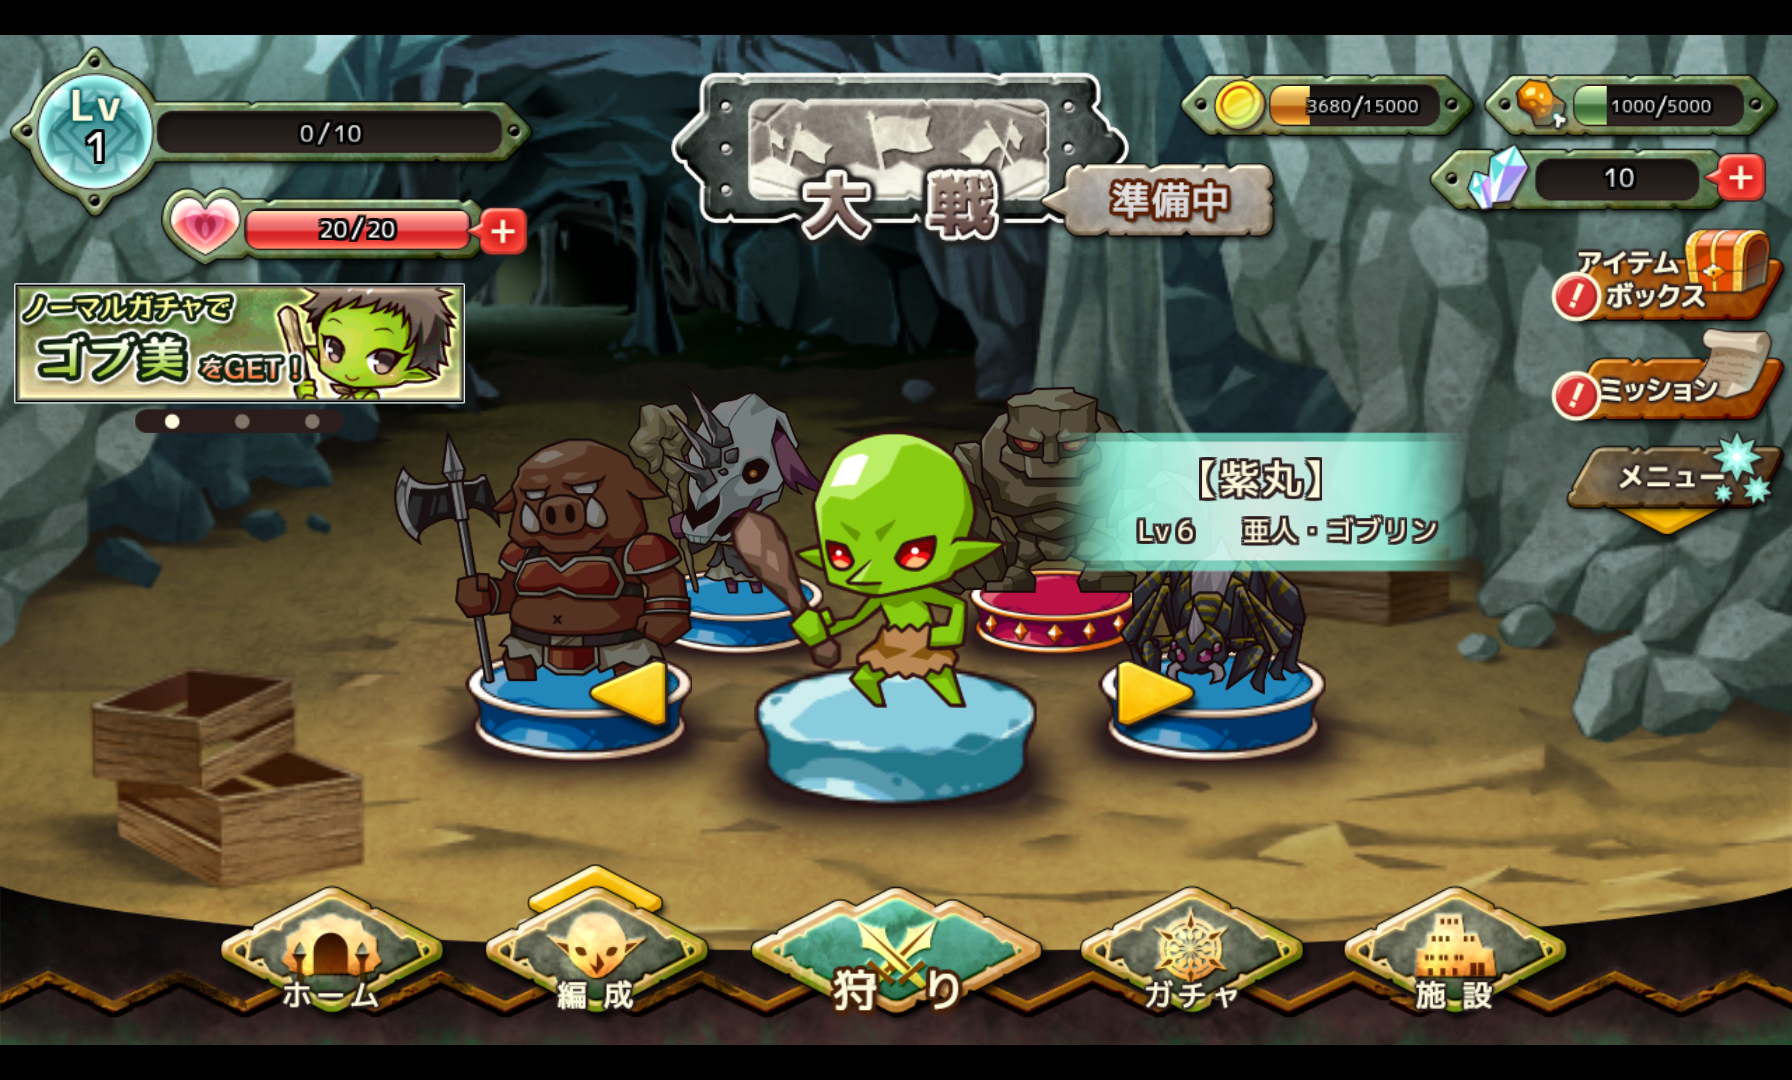 androidアプリ Re:Monster(リ・モンスター)〜ゴブリン転生記〜攻略スクリーンショット3